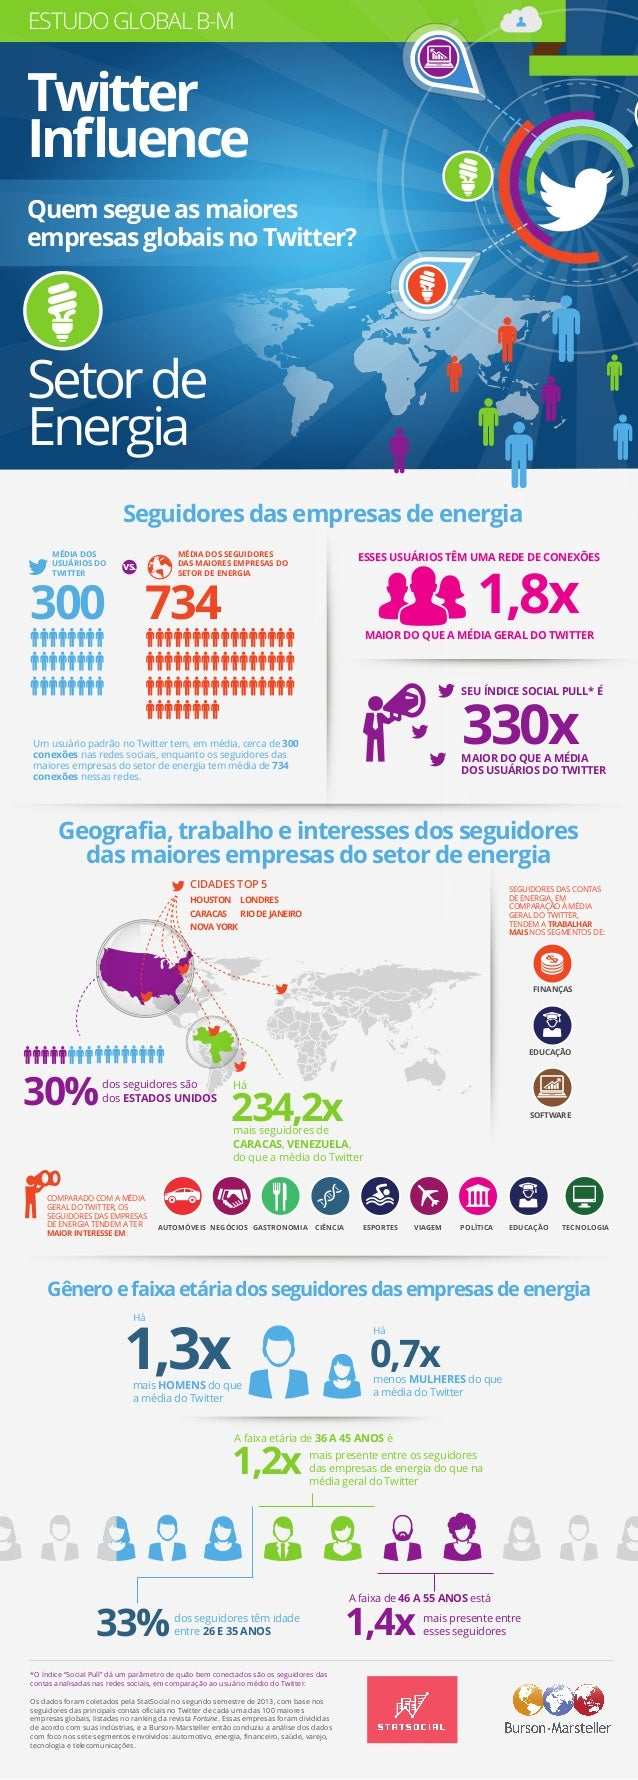 "Estudo Global B-M ""Twitter Influence"" - Infográfico Energia"